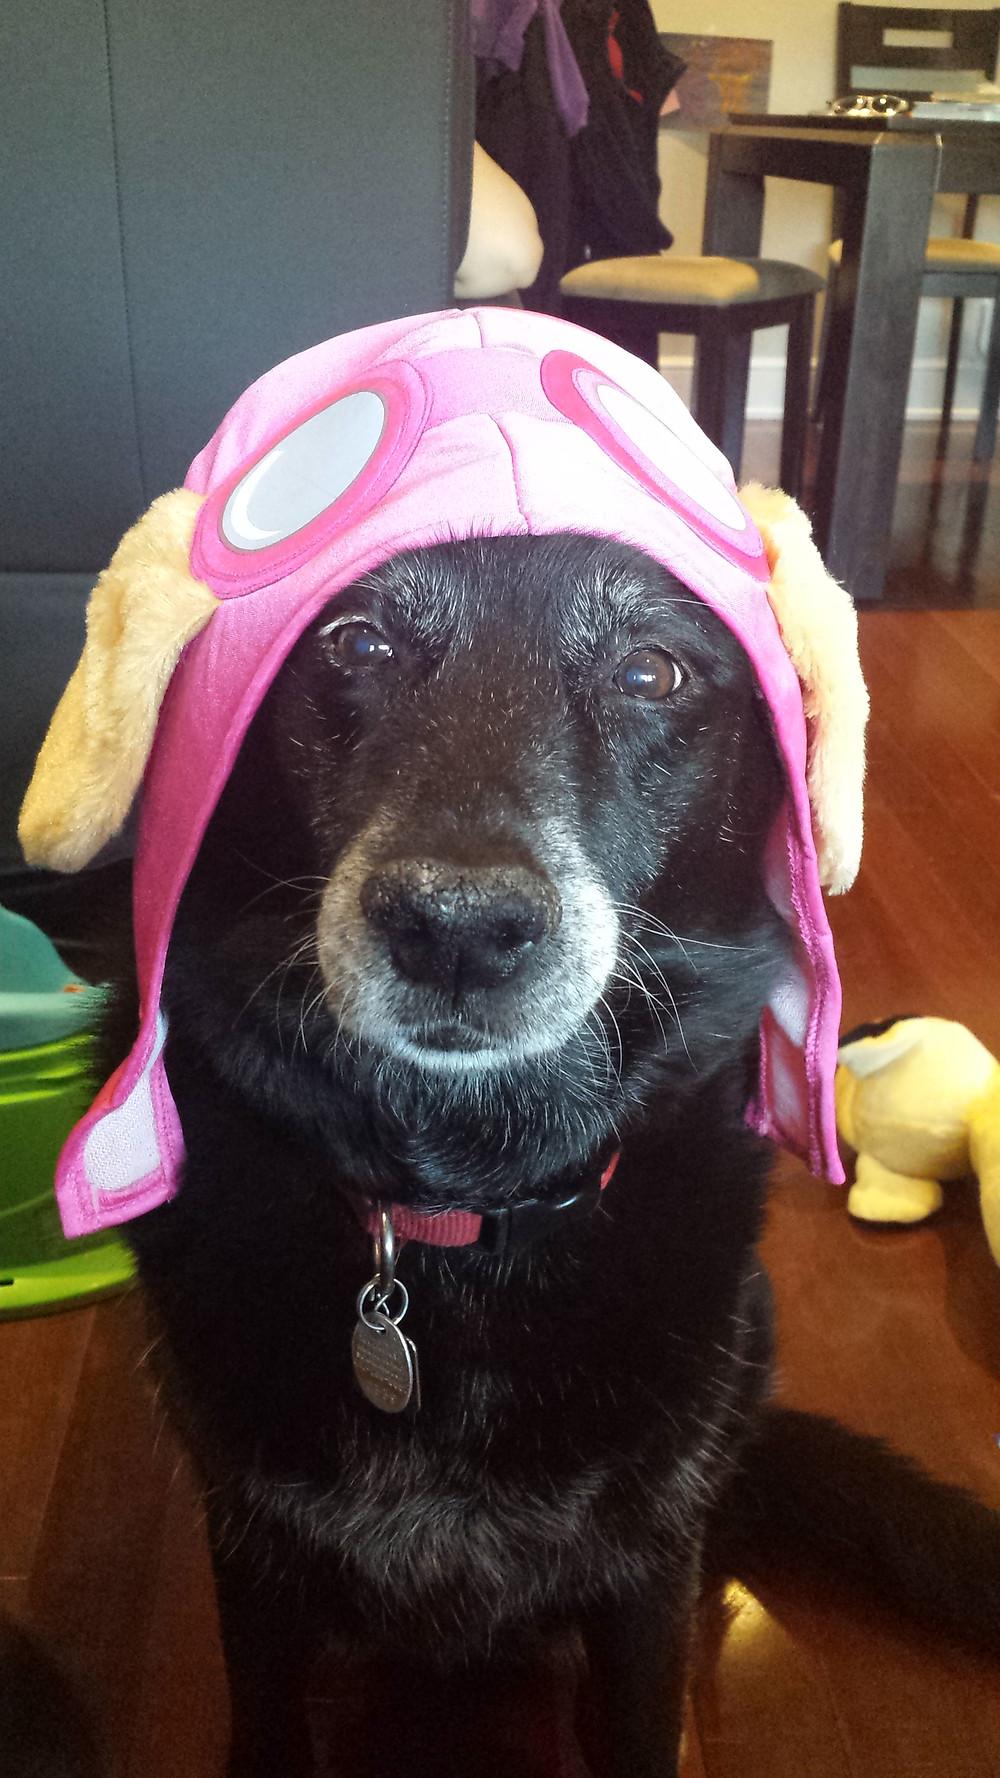 A recent photo of Zuzu wearing a Paw Patrol hat